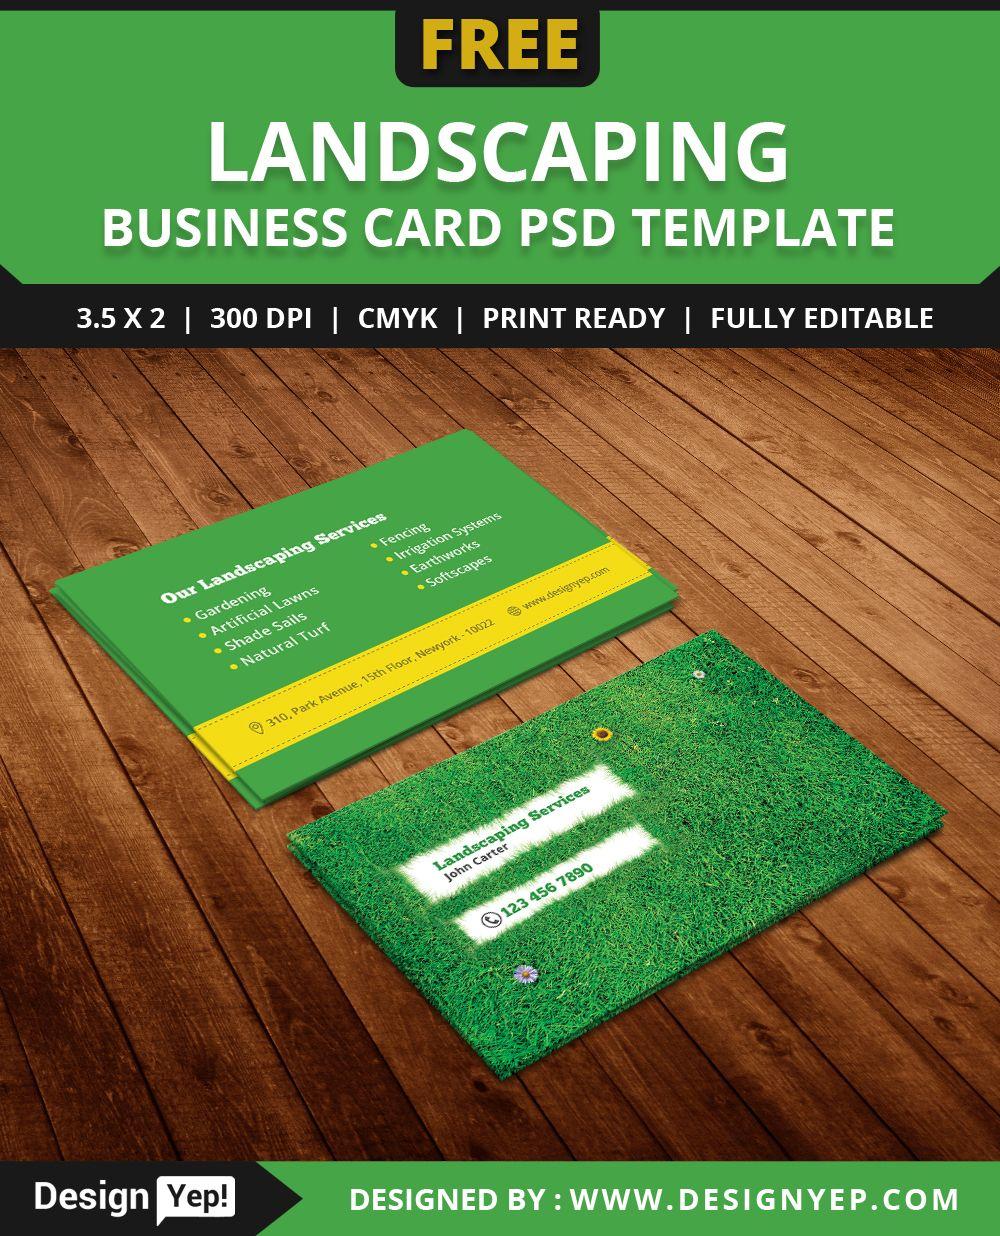 Freelandscapingbusinesscardtemplatepsd landscaping